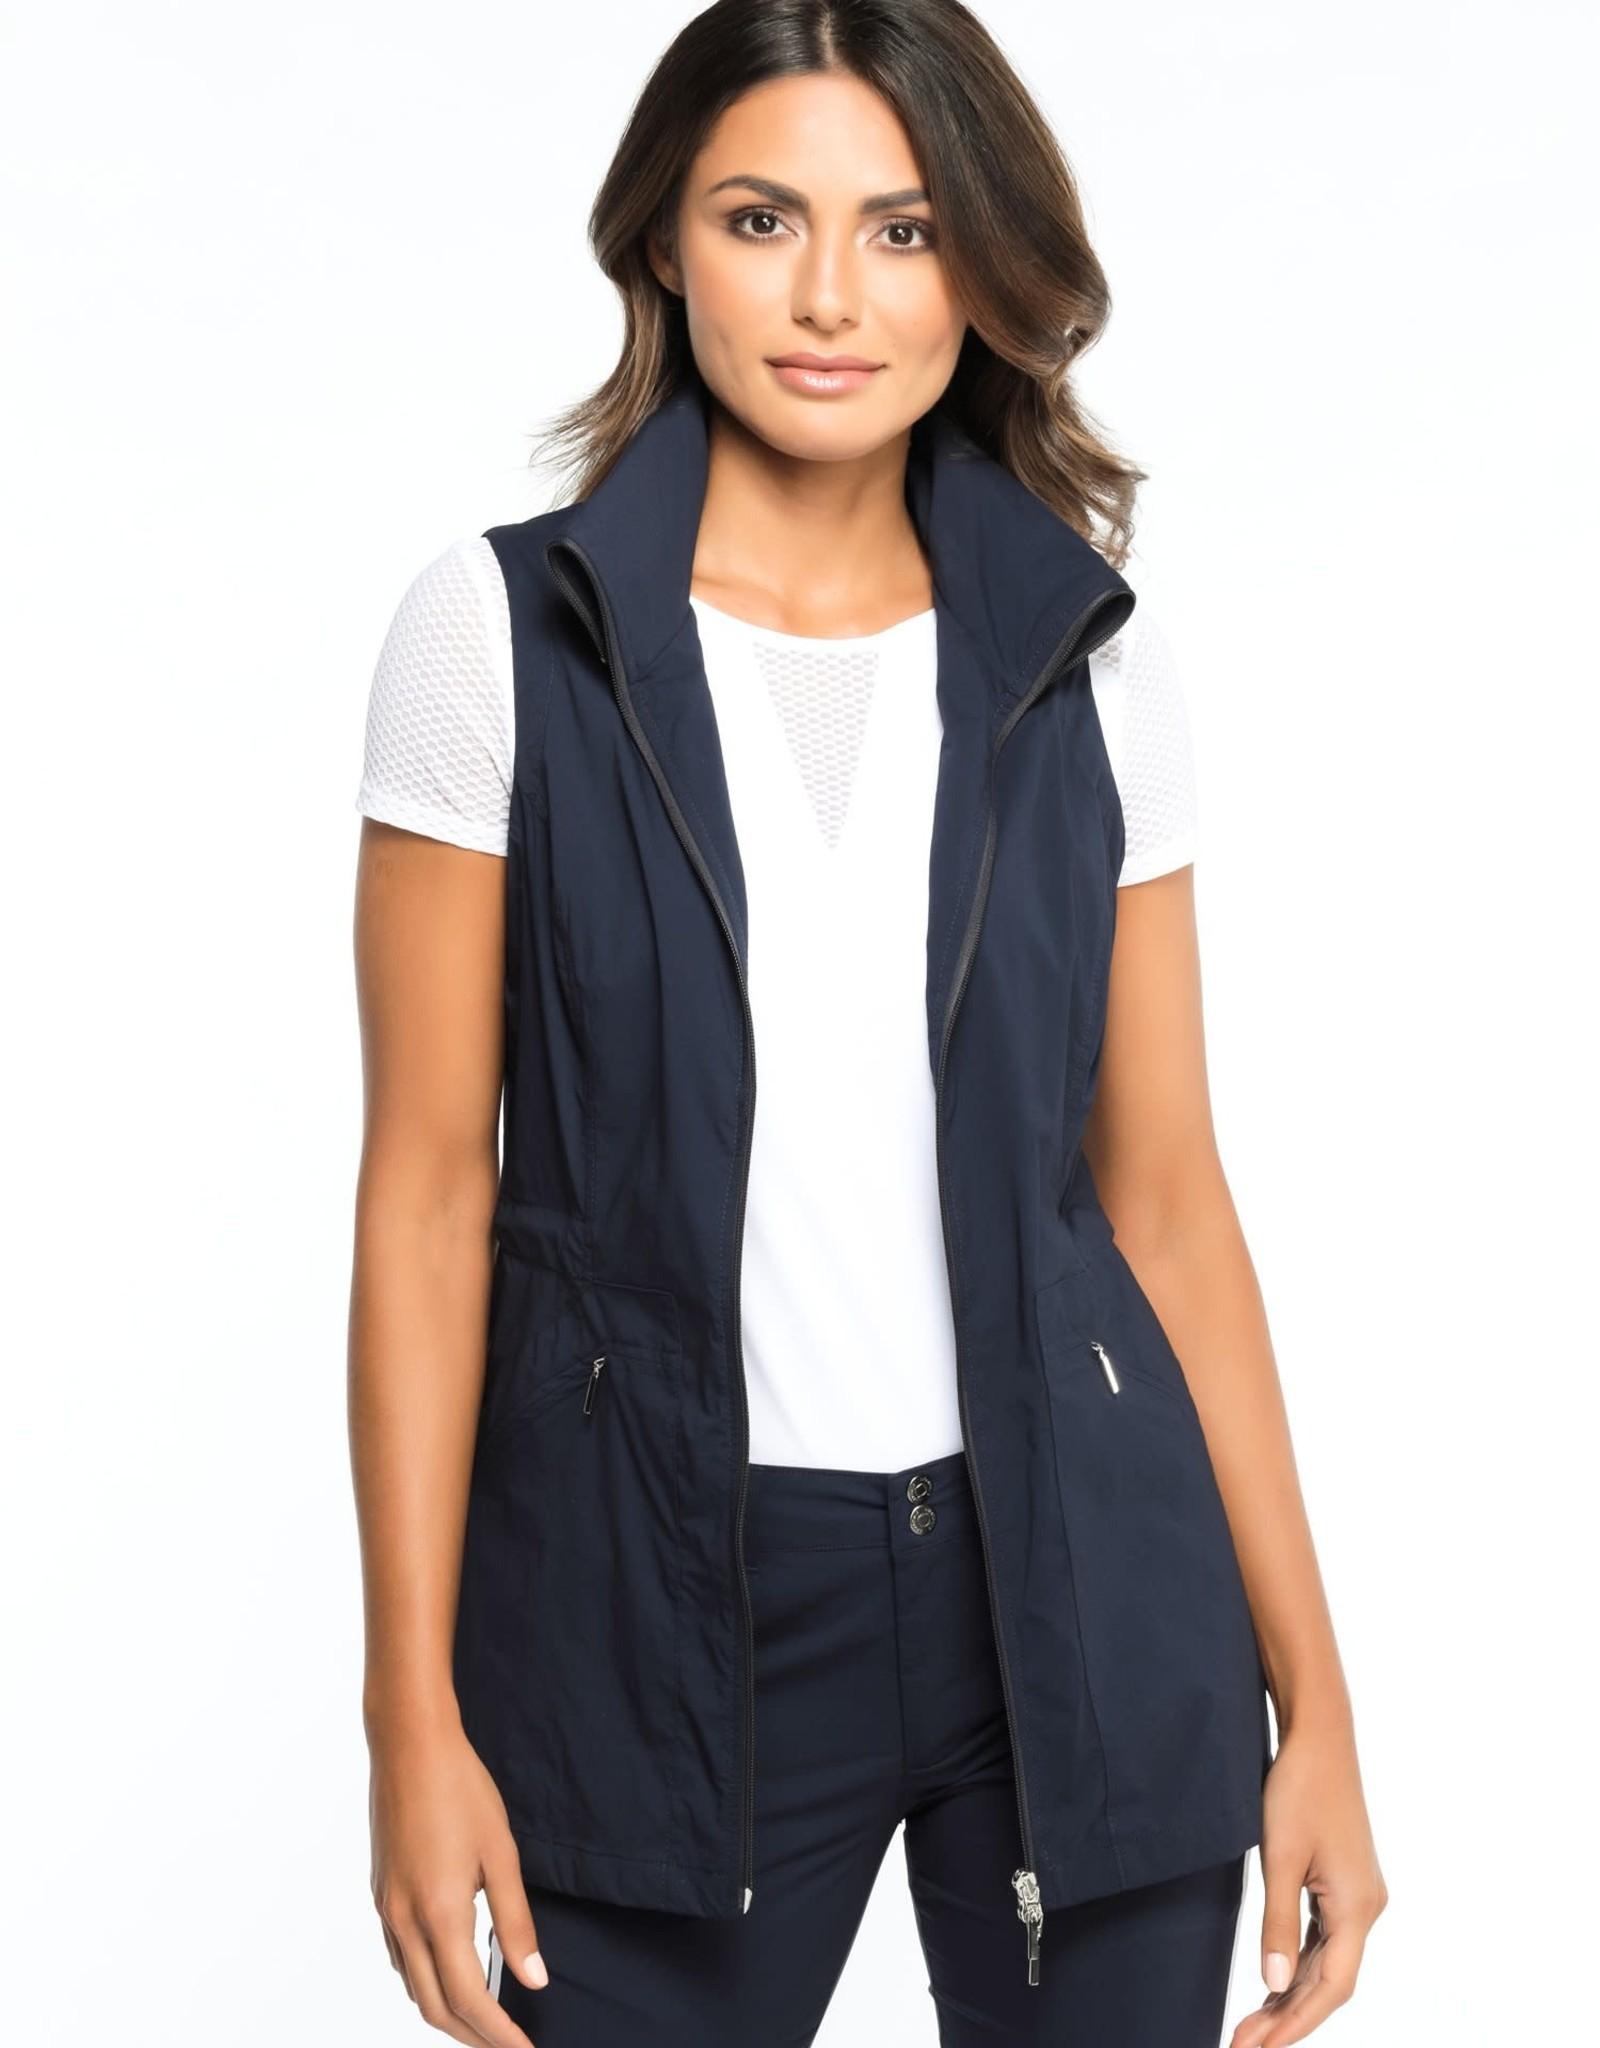 Anatomie DELANEY Travel Vest